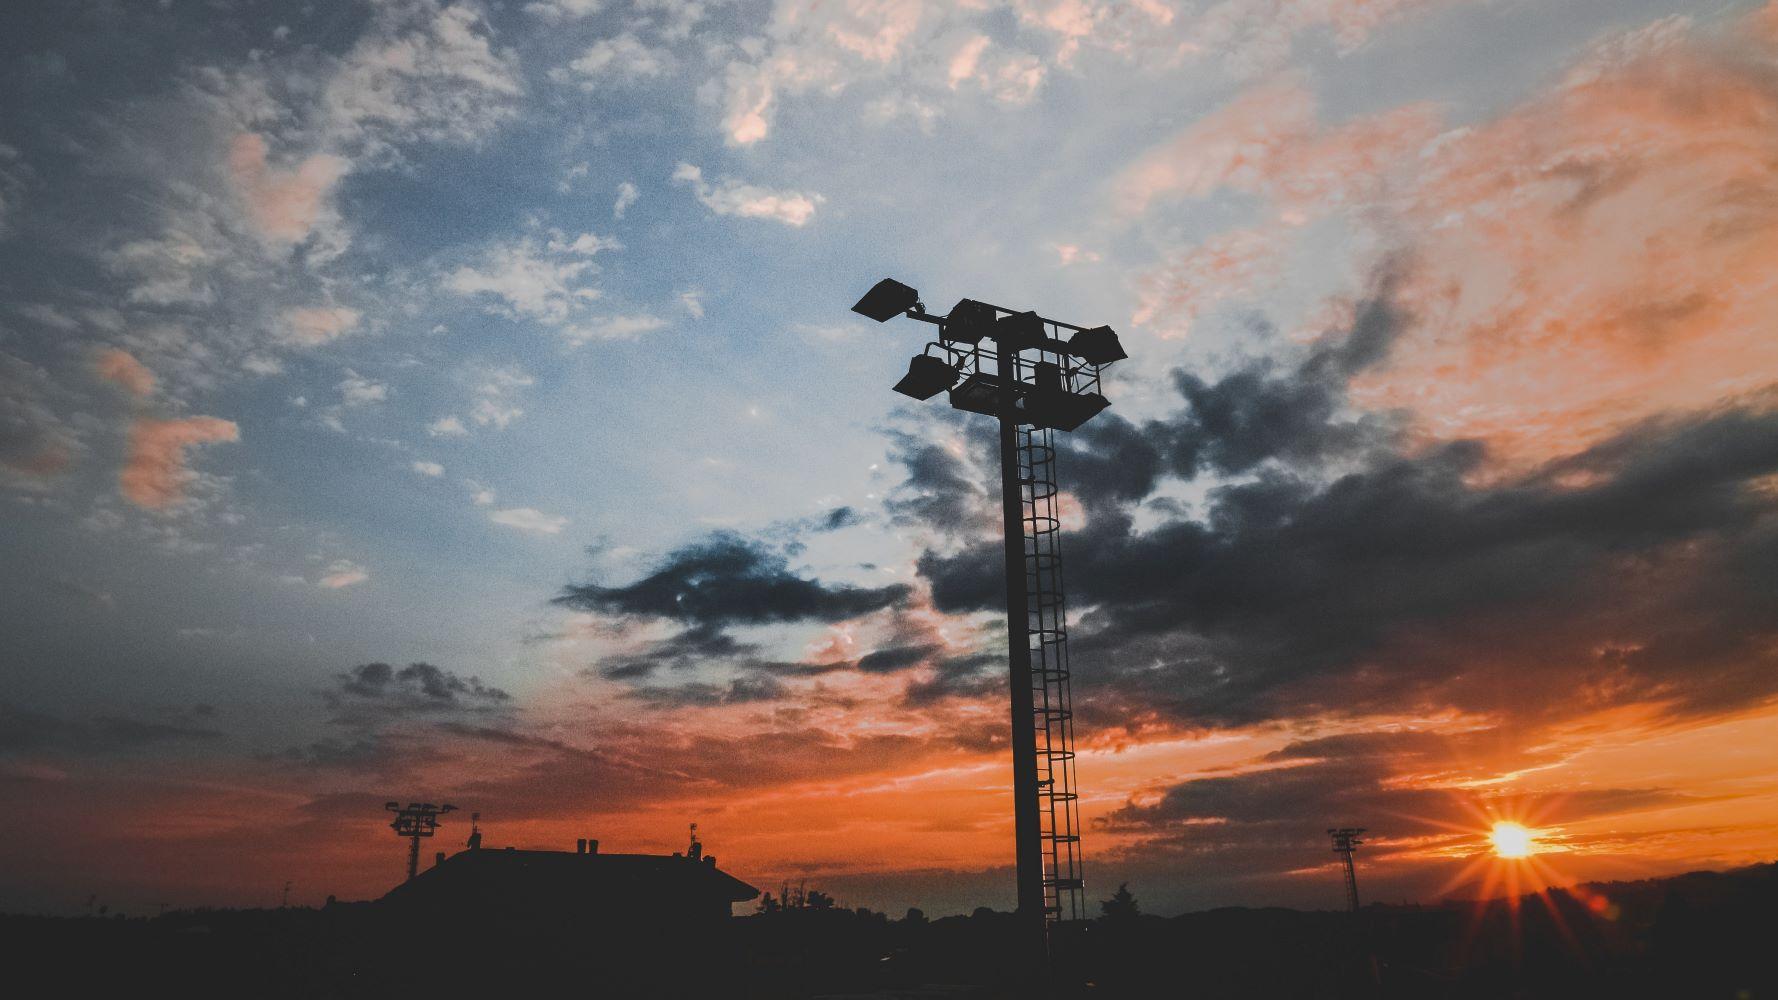 sunset-over-stadiumcredits-oleg-magni